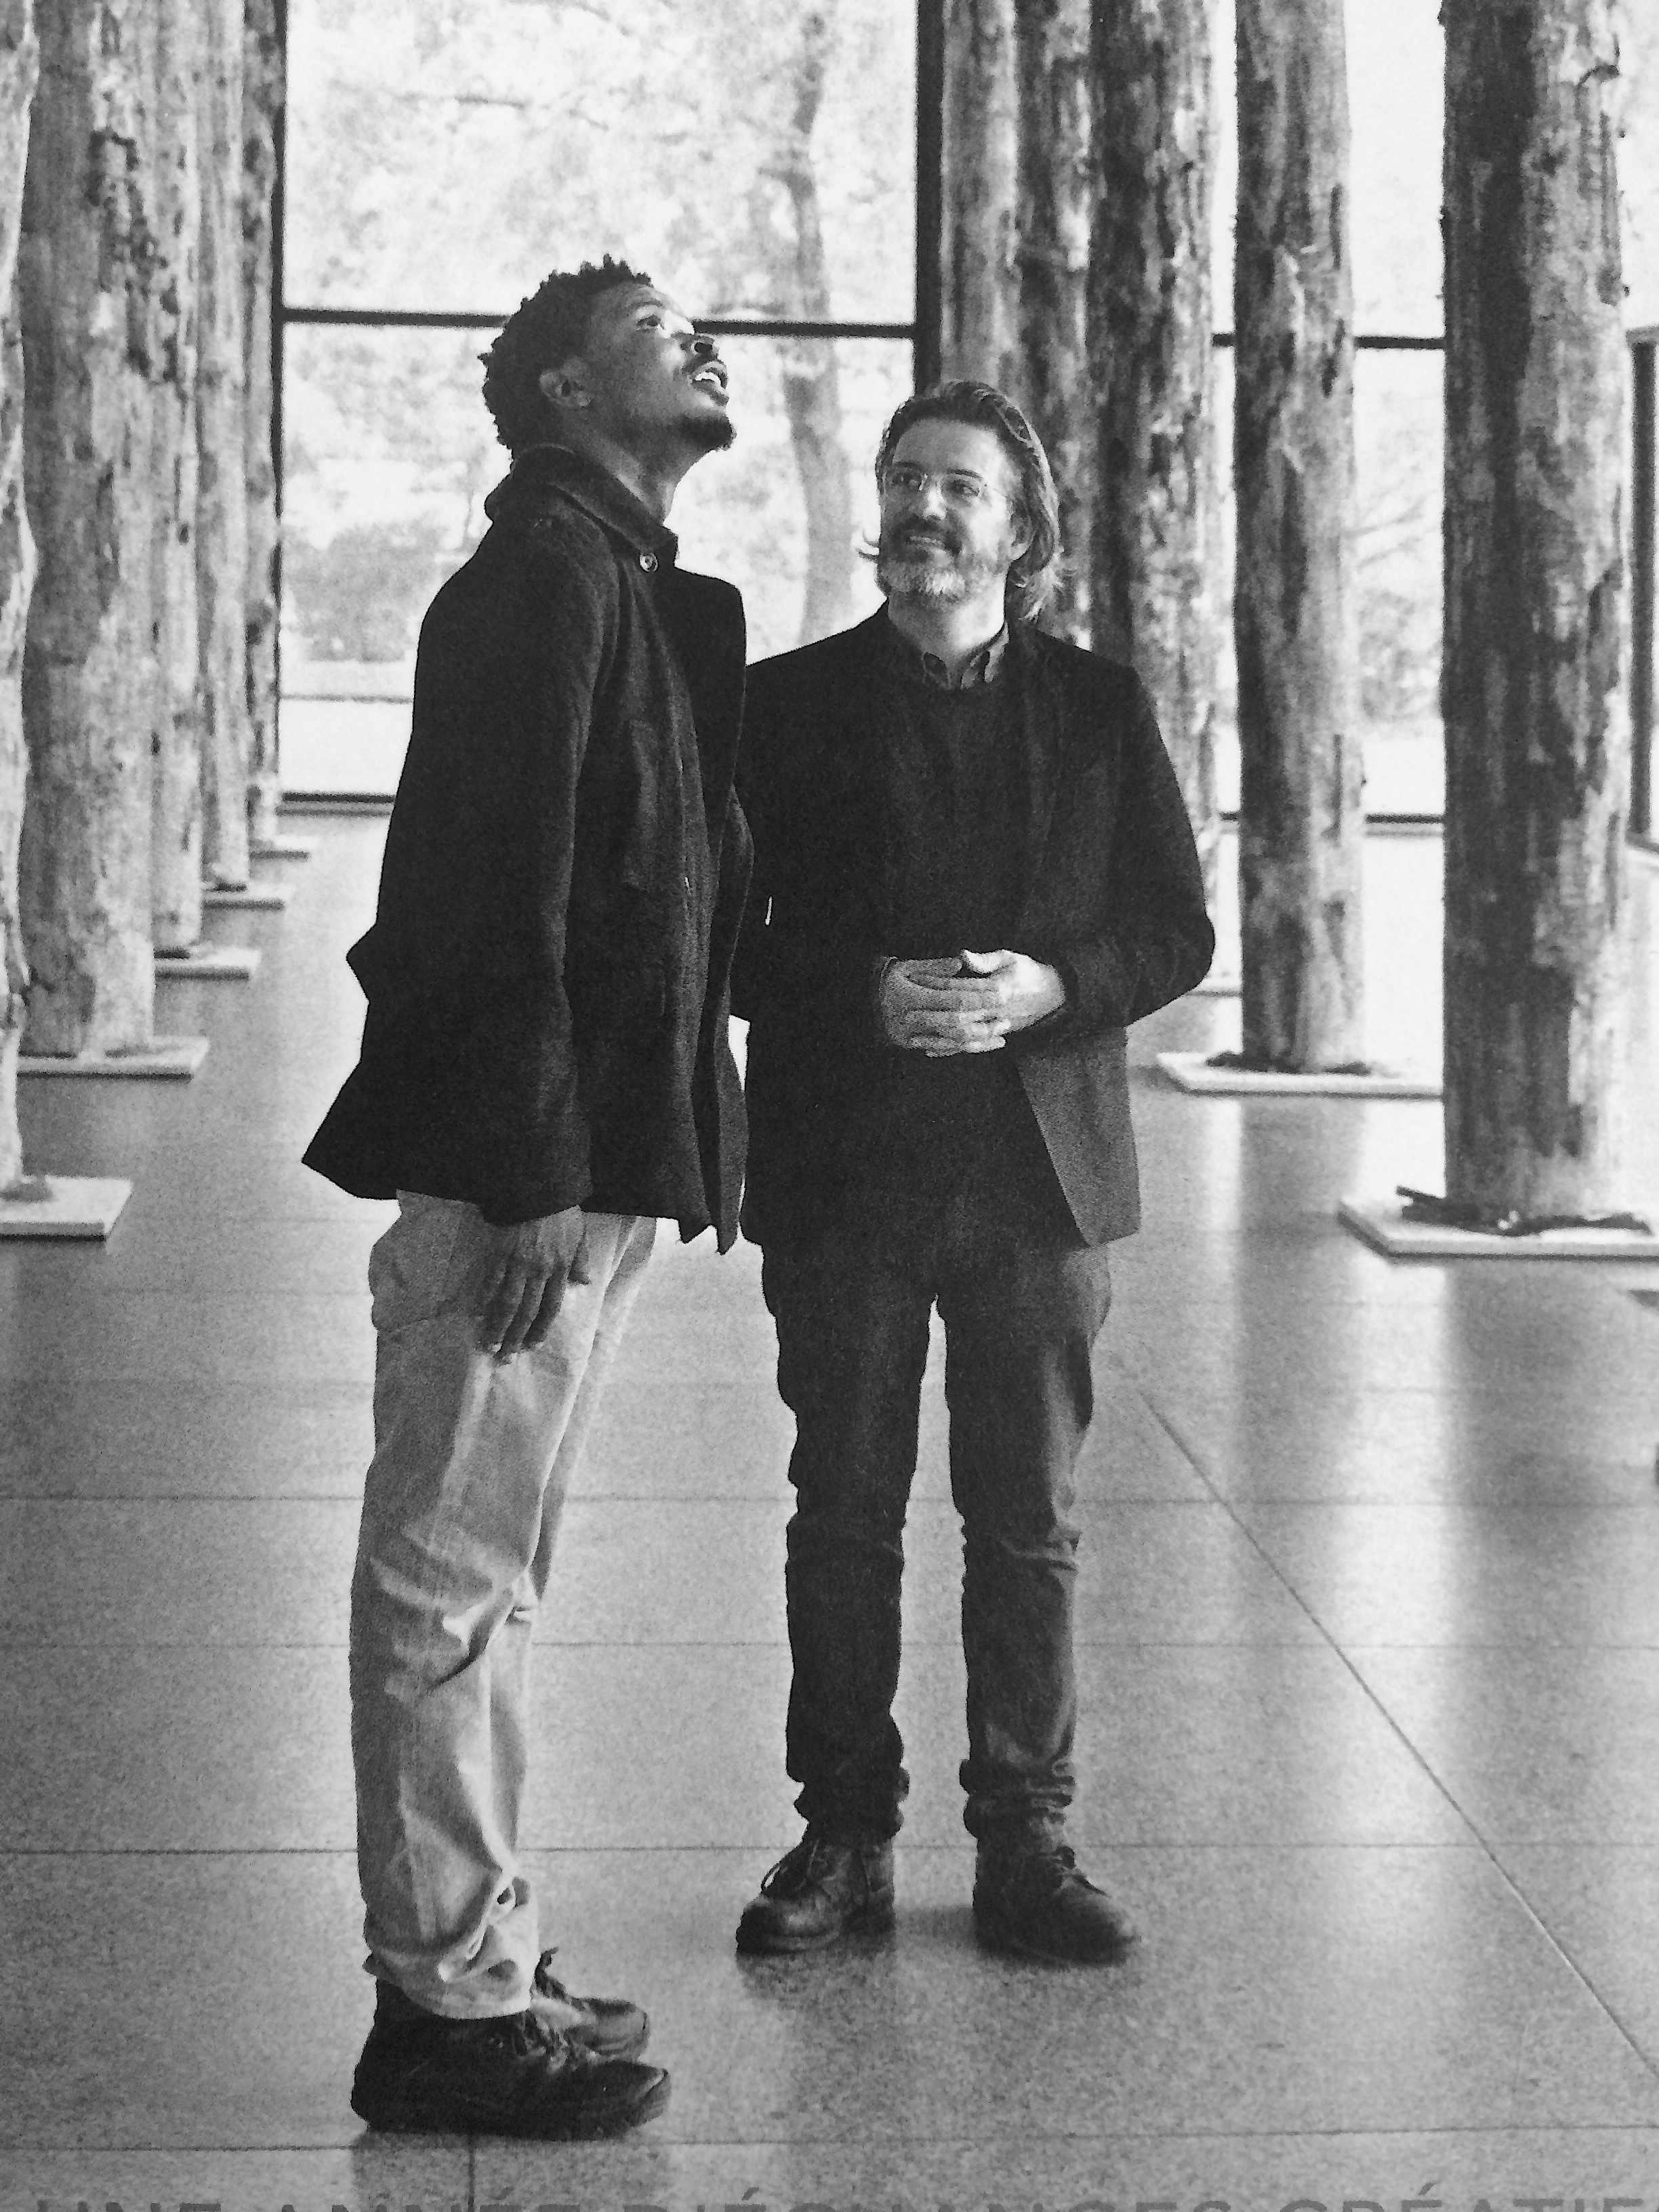 Sammy Baloji et Olafur Eliassonphotographiésau sein delaNeue Nationalgalerie àBerlin lors du mentorat Rolex 2014-2015. ©Rolex/Tomas Bertelsen